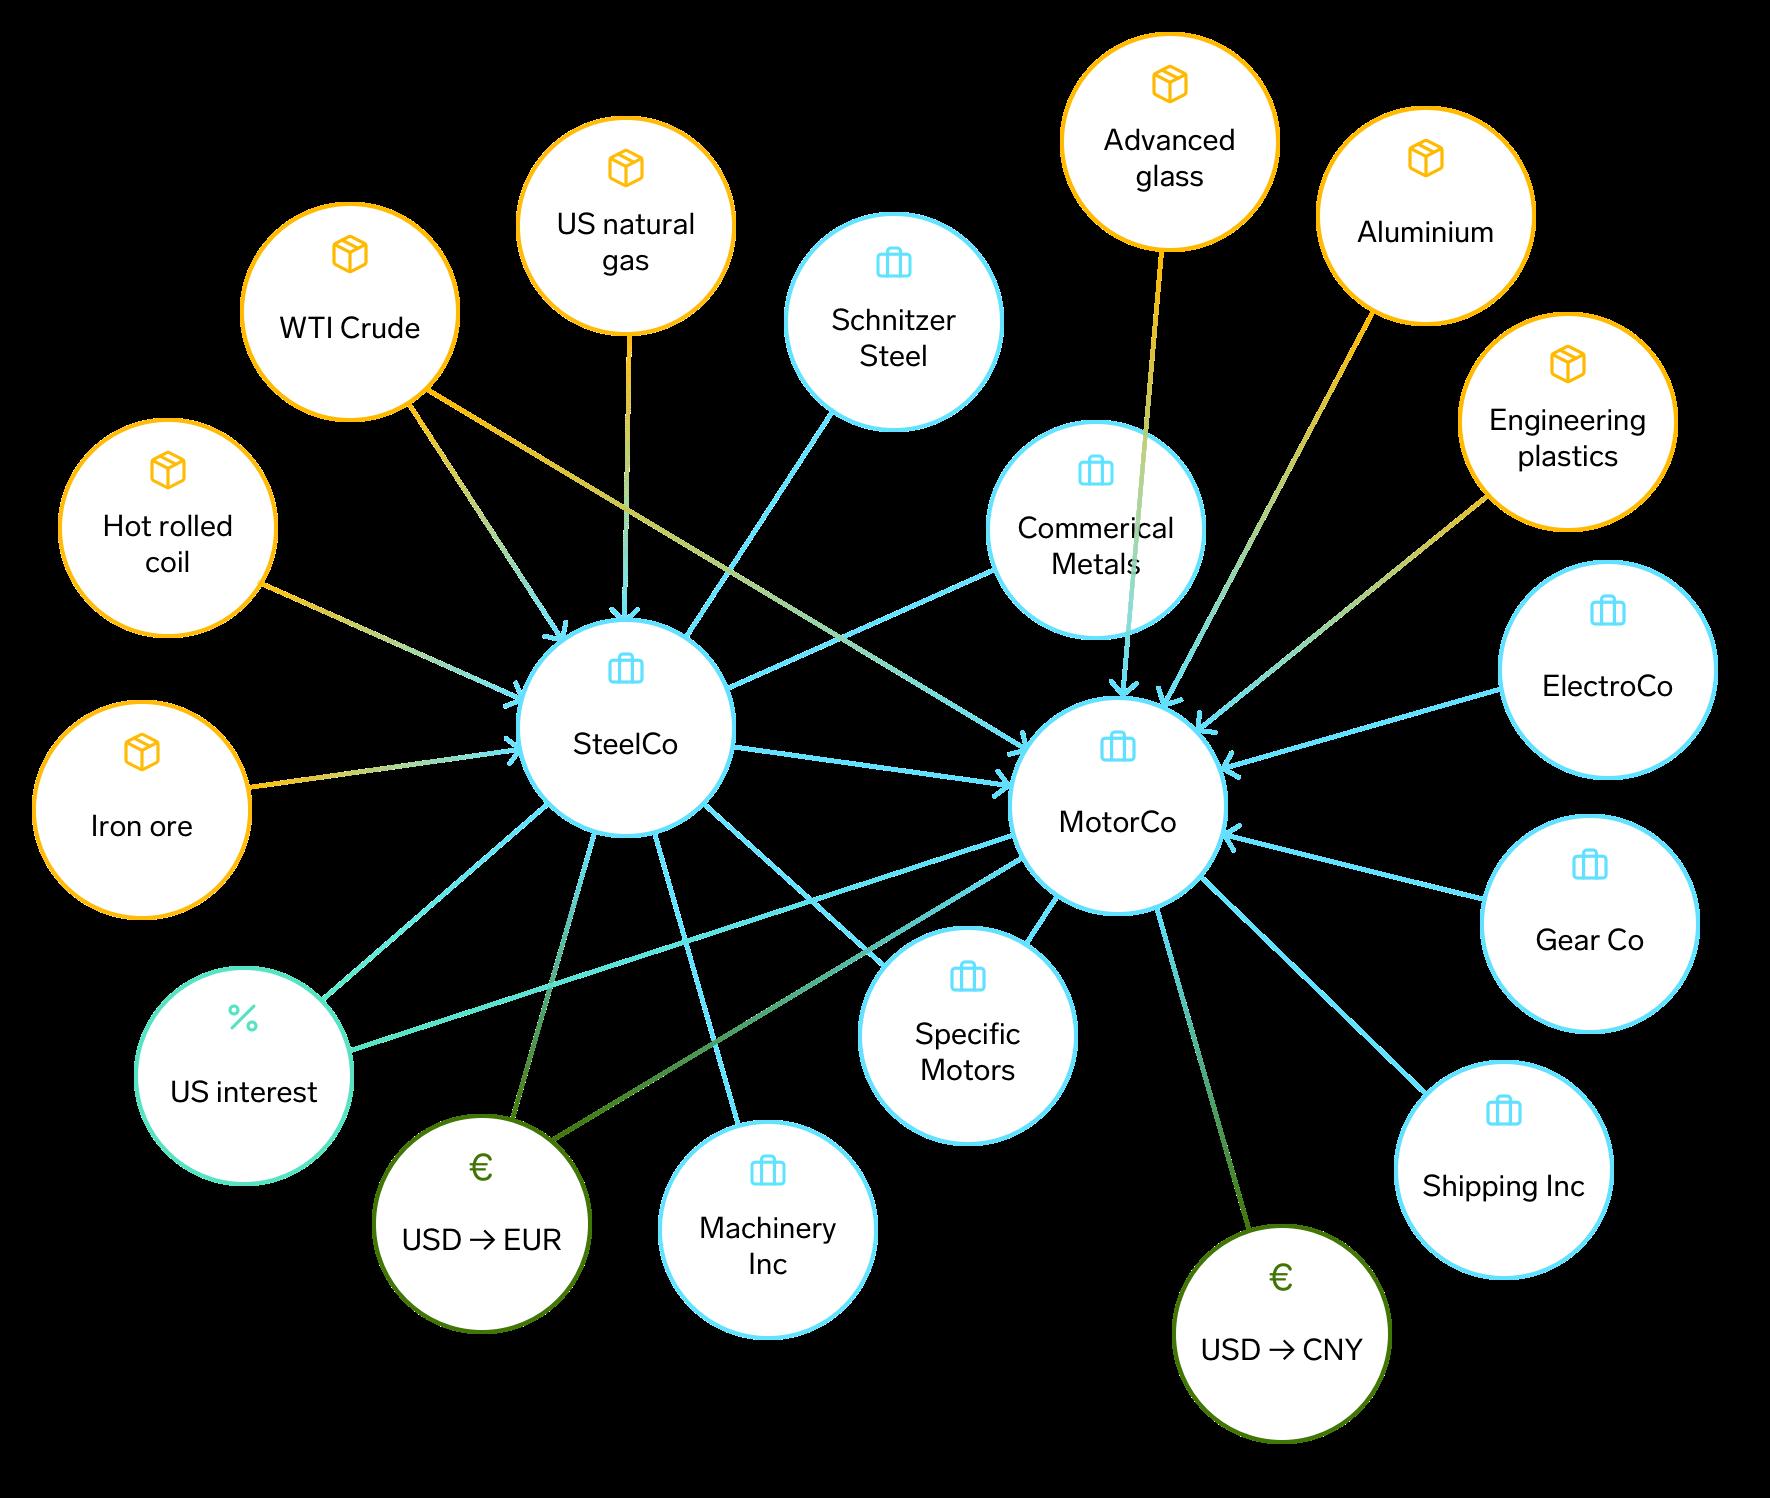 Exabel's impact graph